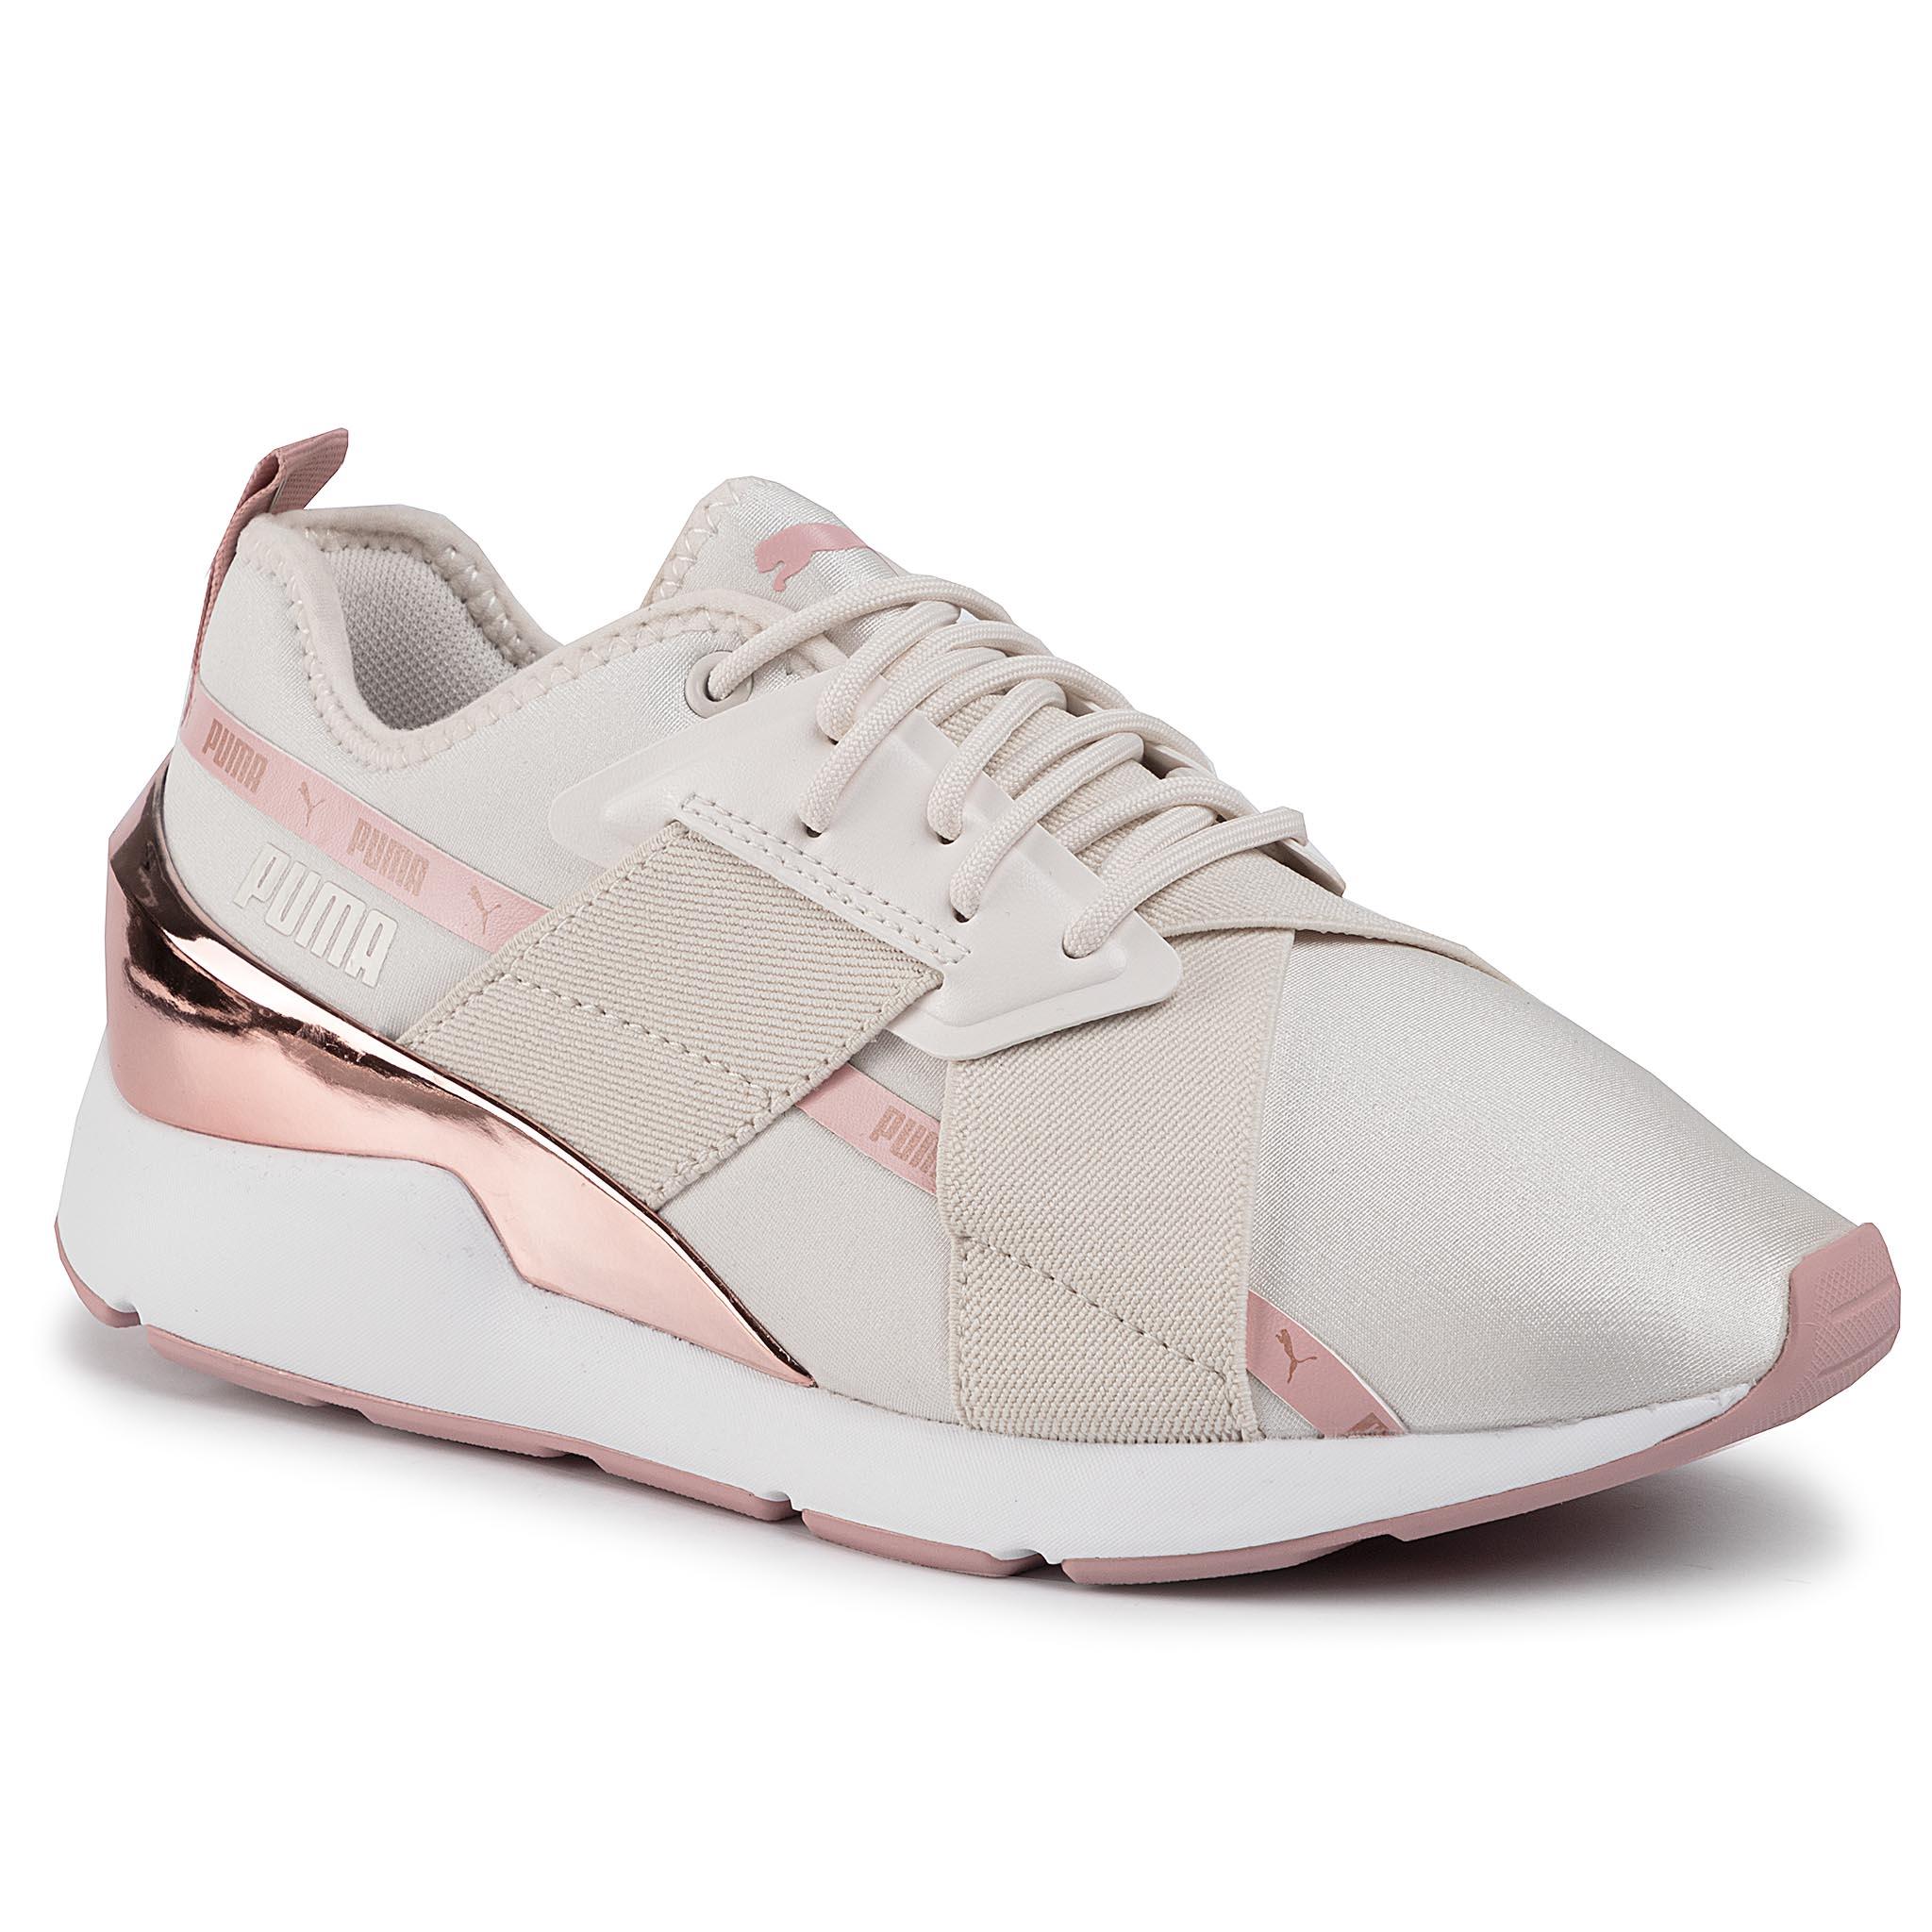 Olcsó Női Puma Muse X 2 Metallic Sneaker, Puma Futócipő Női